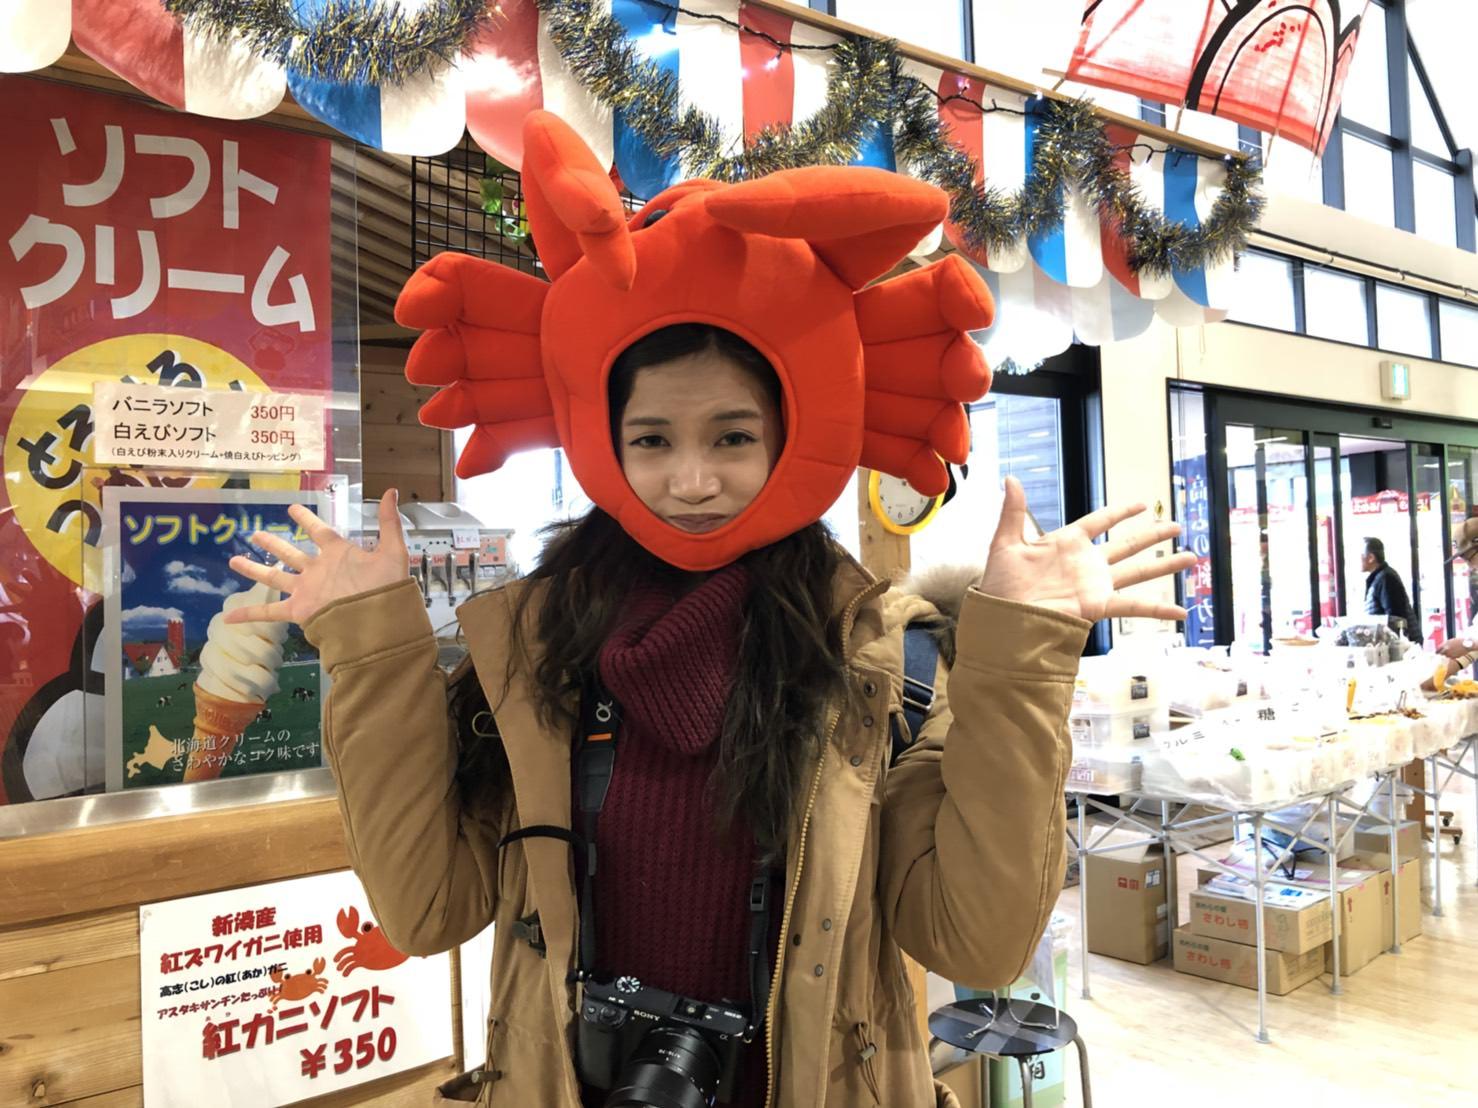 [北陸富山旅遊]新湊きっときと市場-大吃富山灣新鮮海味!便宜大螃蟹不可錯過 @美食好芃友